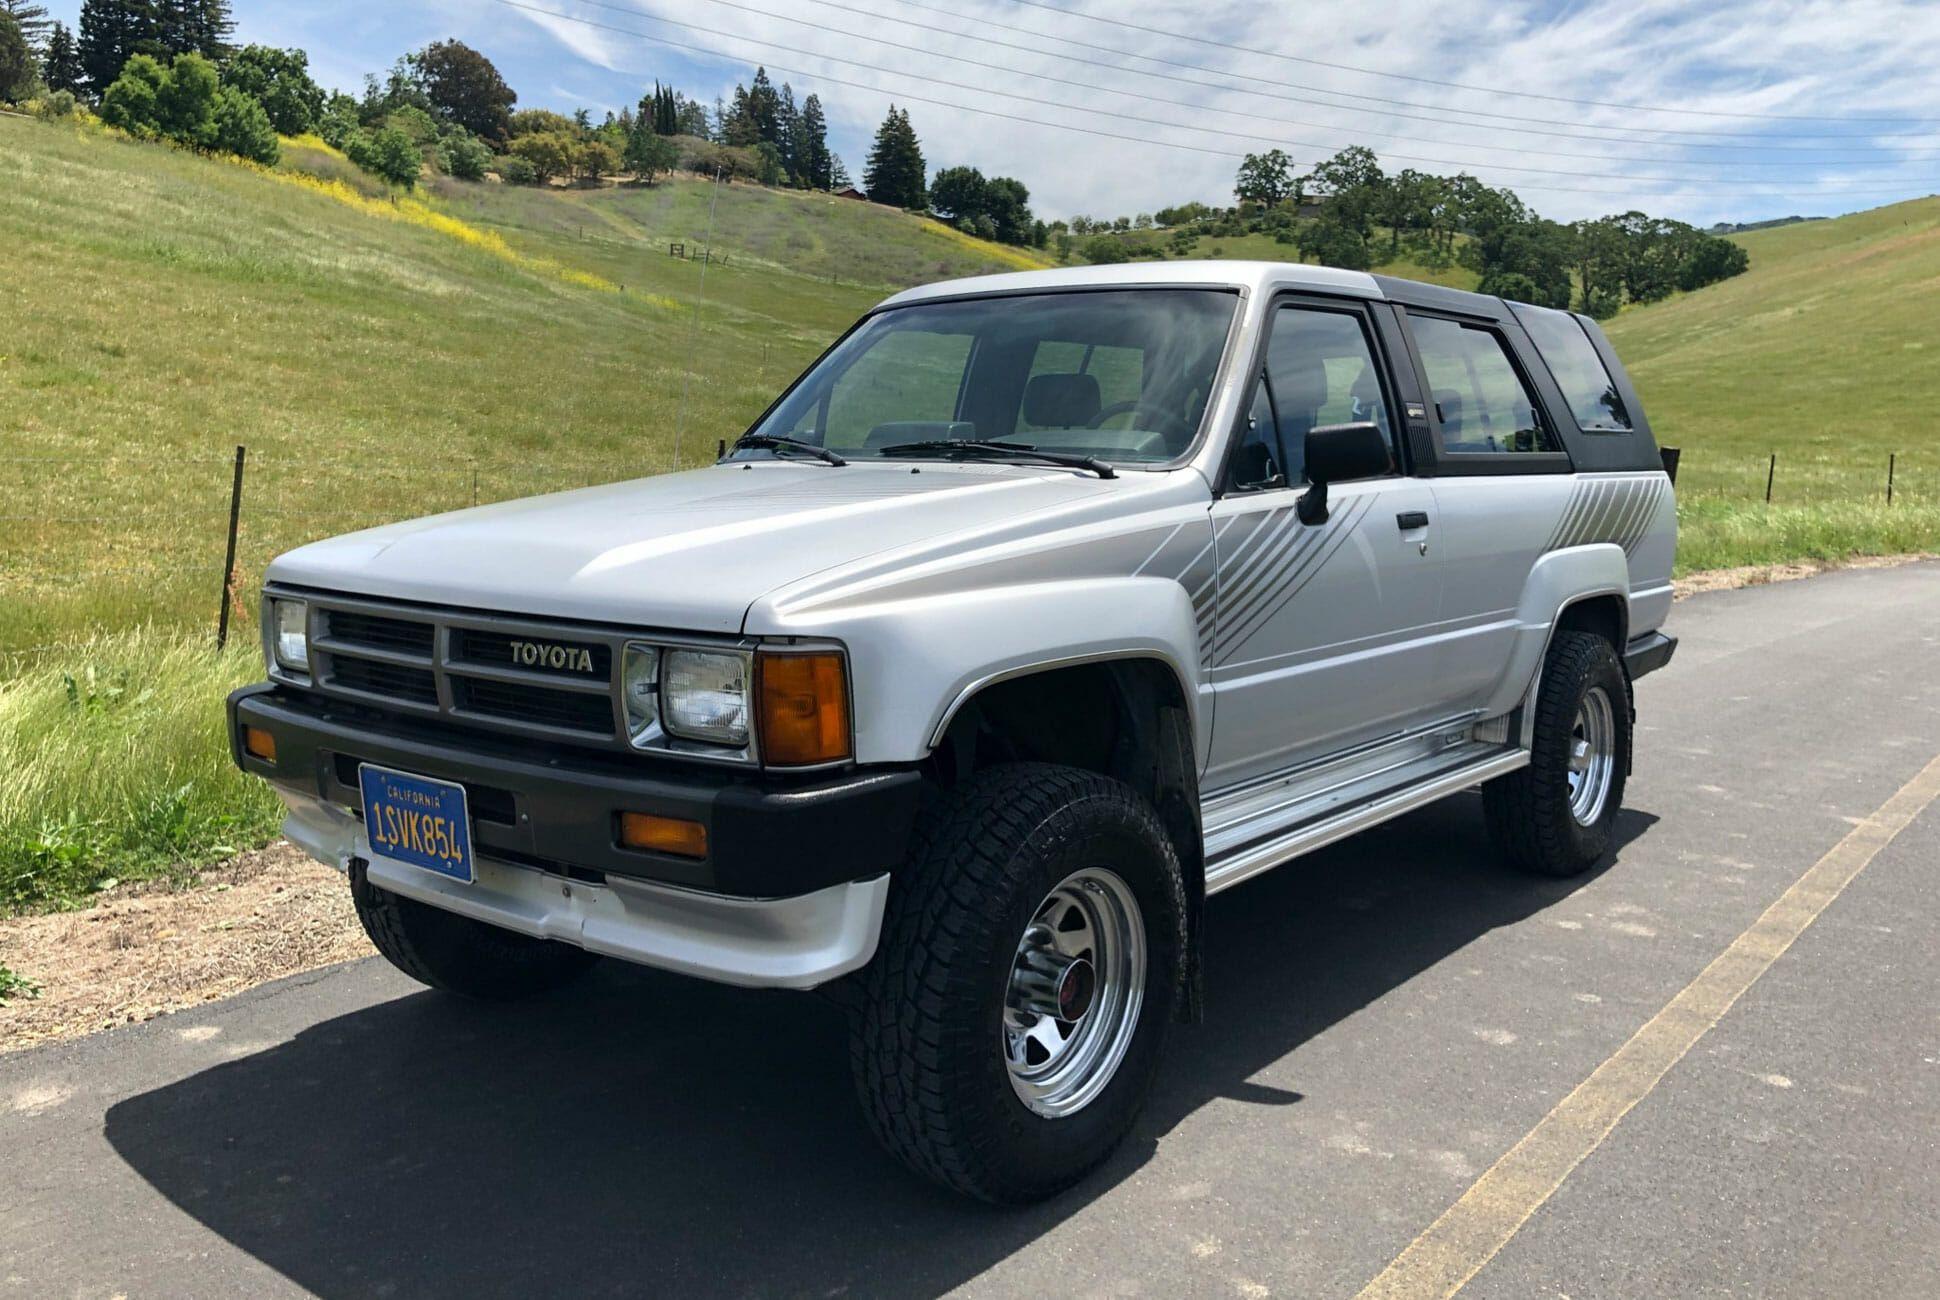 Blue-Plate-1987-Toyota-4Runner-Gear-Patrol-slide-1